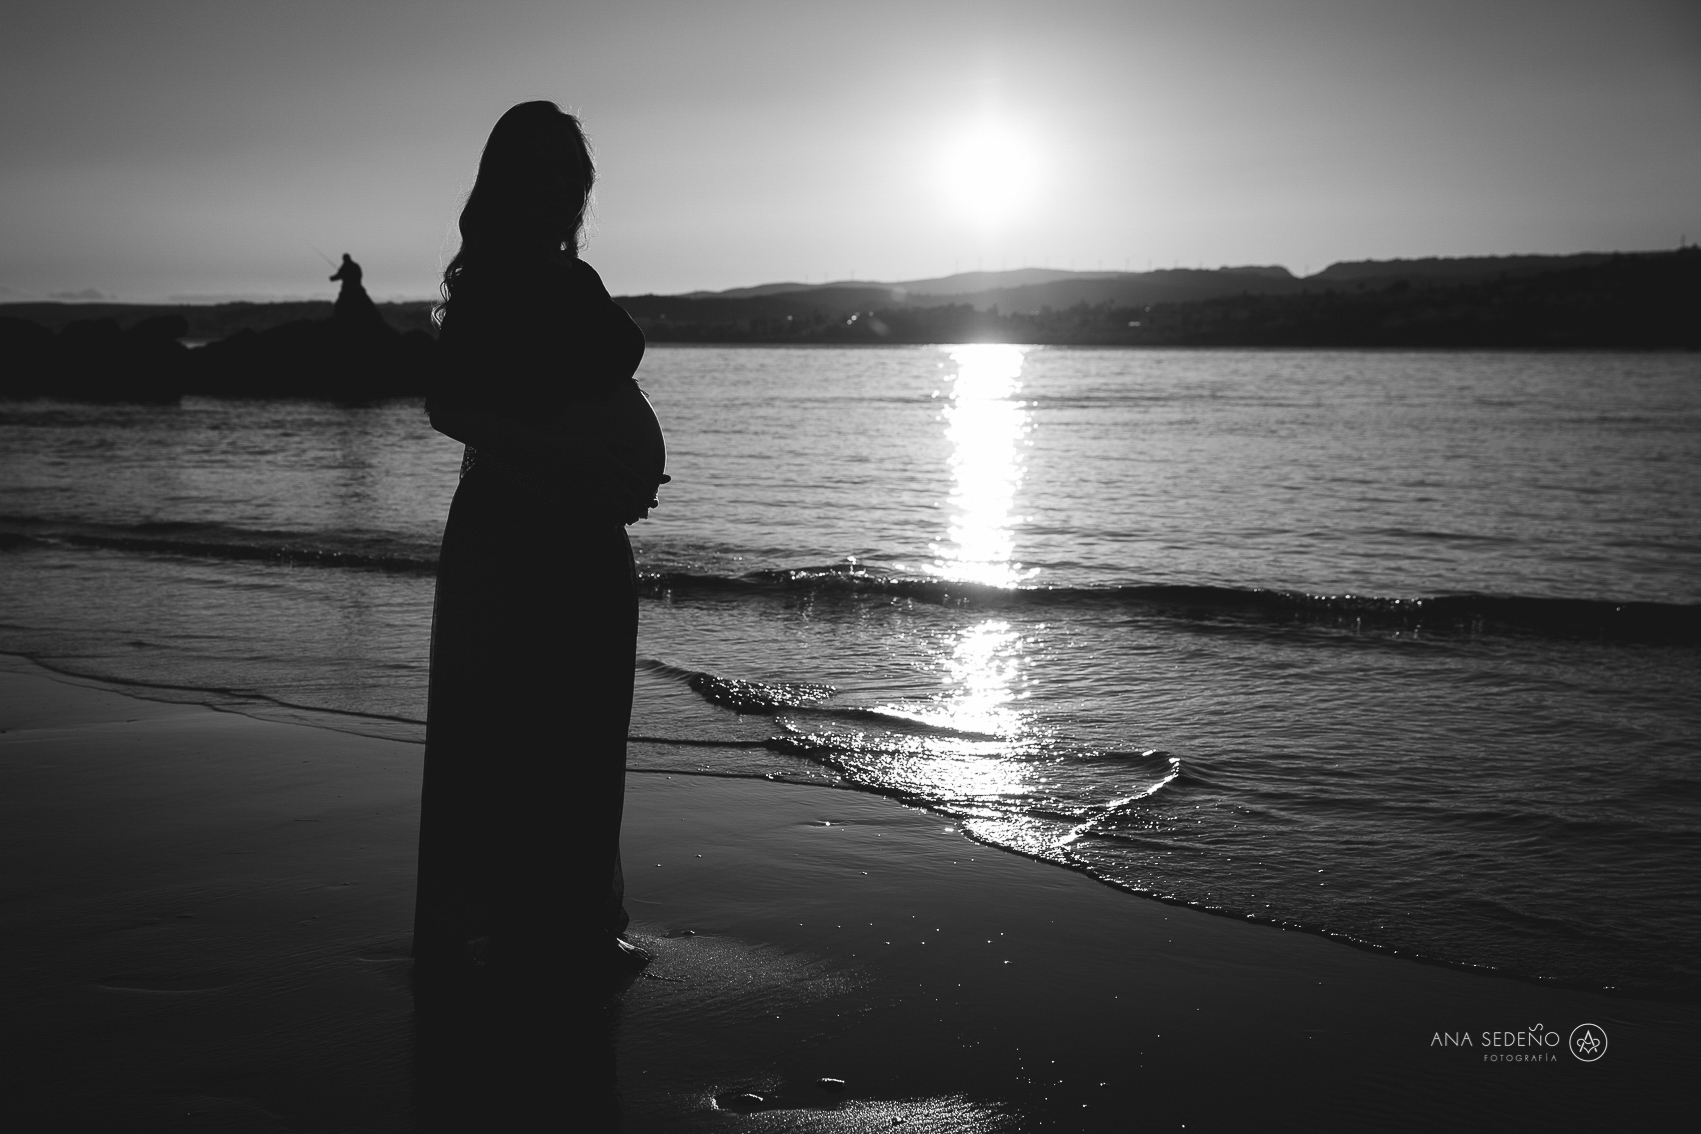 Ana Sedeño Fotografa.-VickyM0222